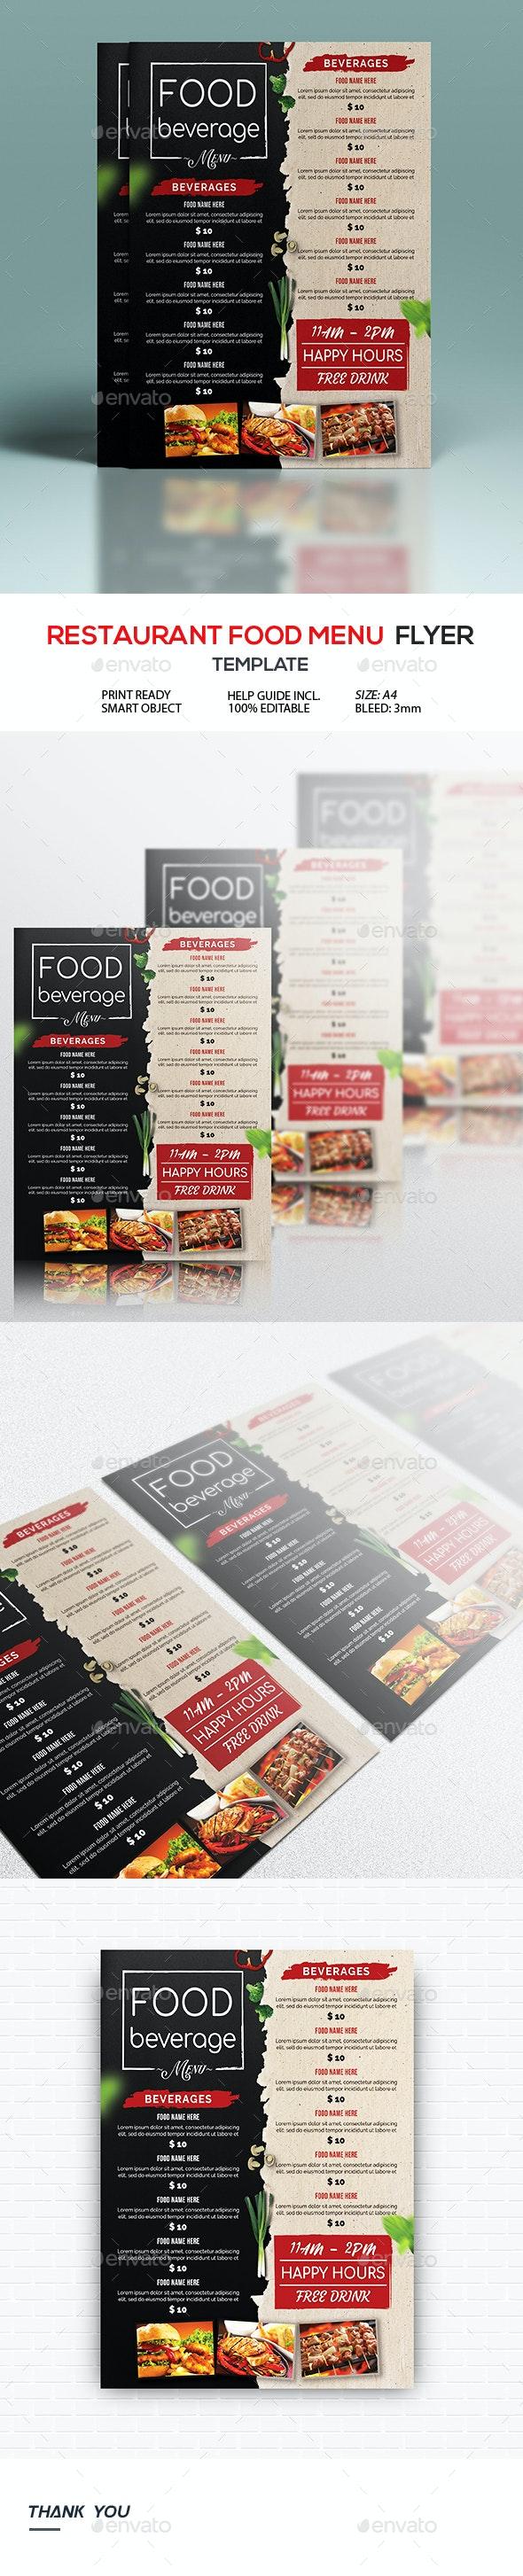 Restaurant Food Menu Flyer - Restaurant Flyers